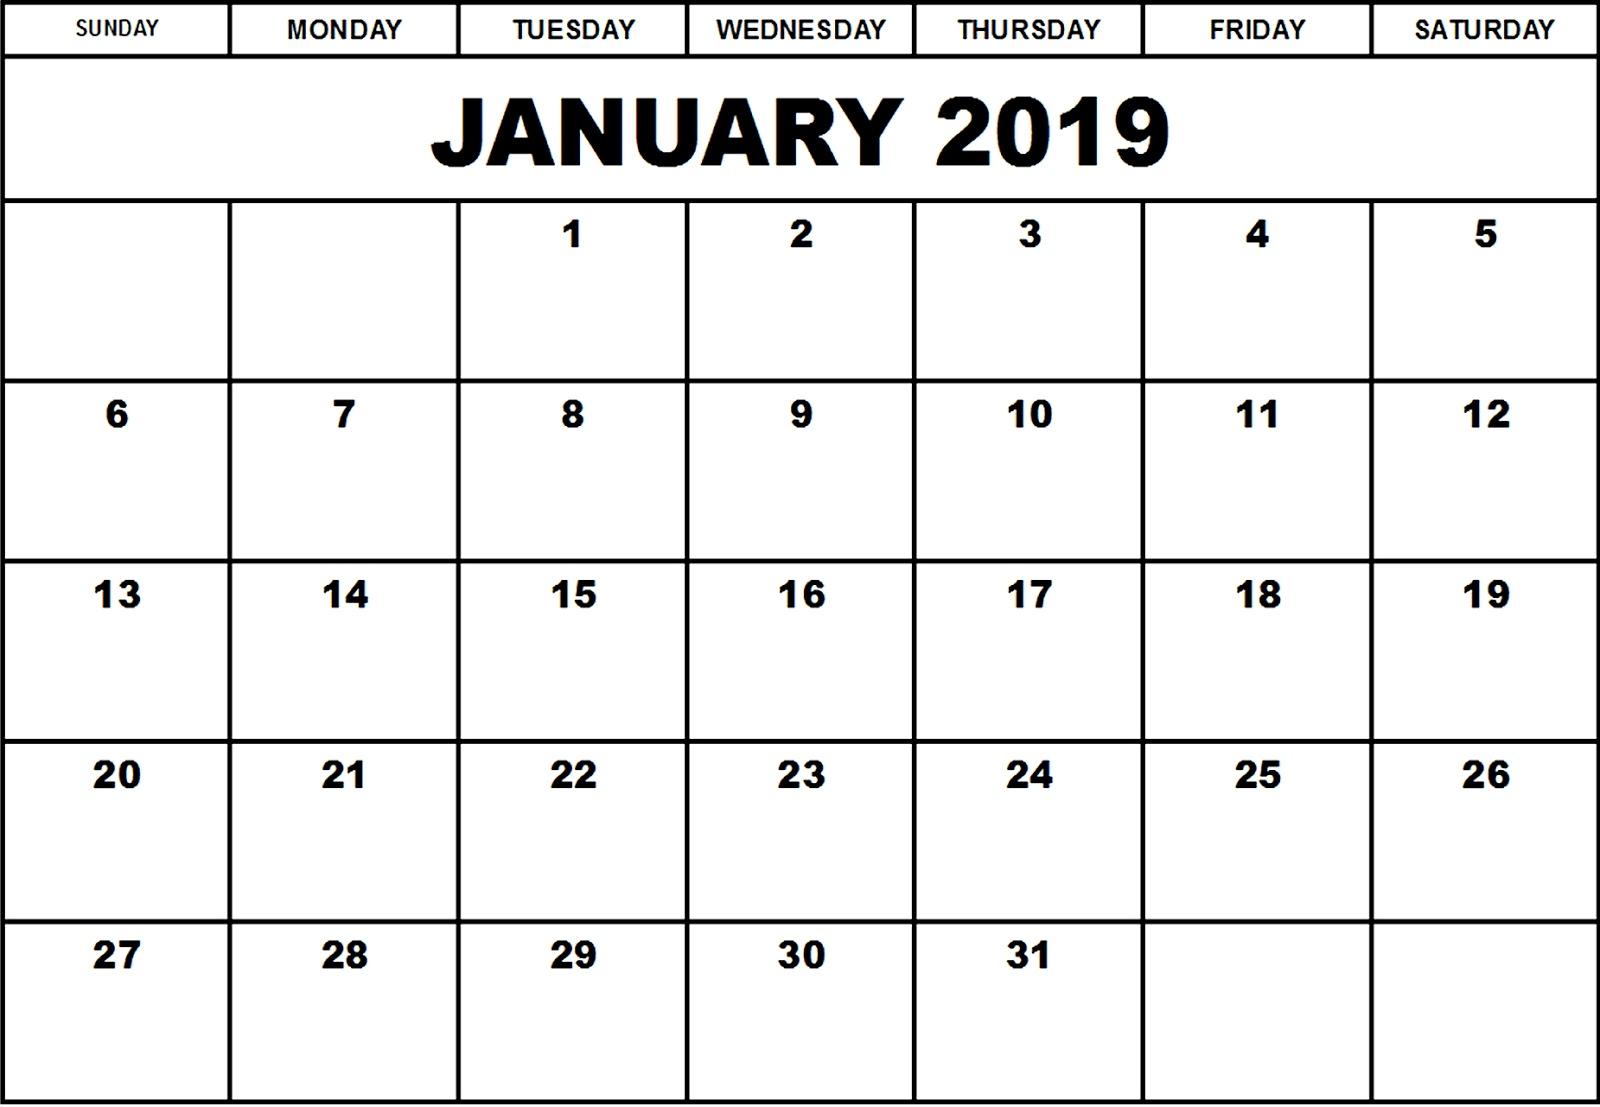 January 2019 Editable Calendar Free Download